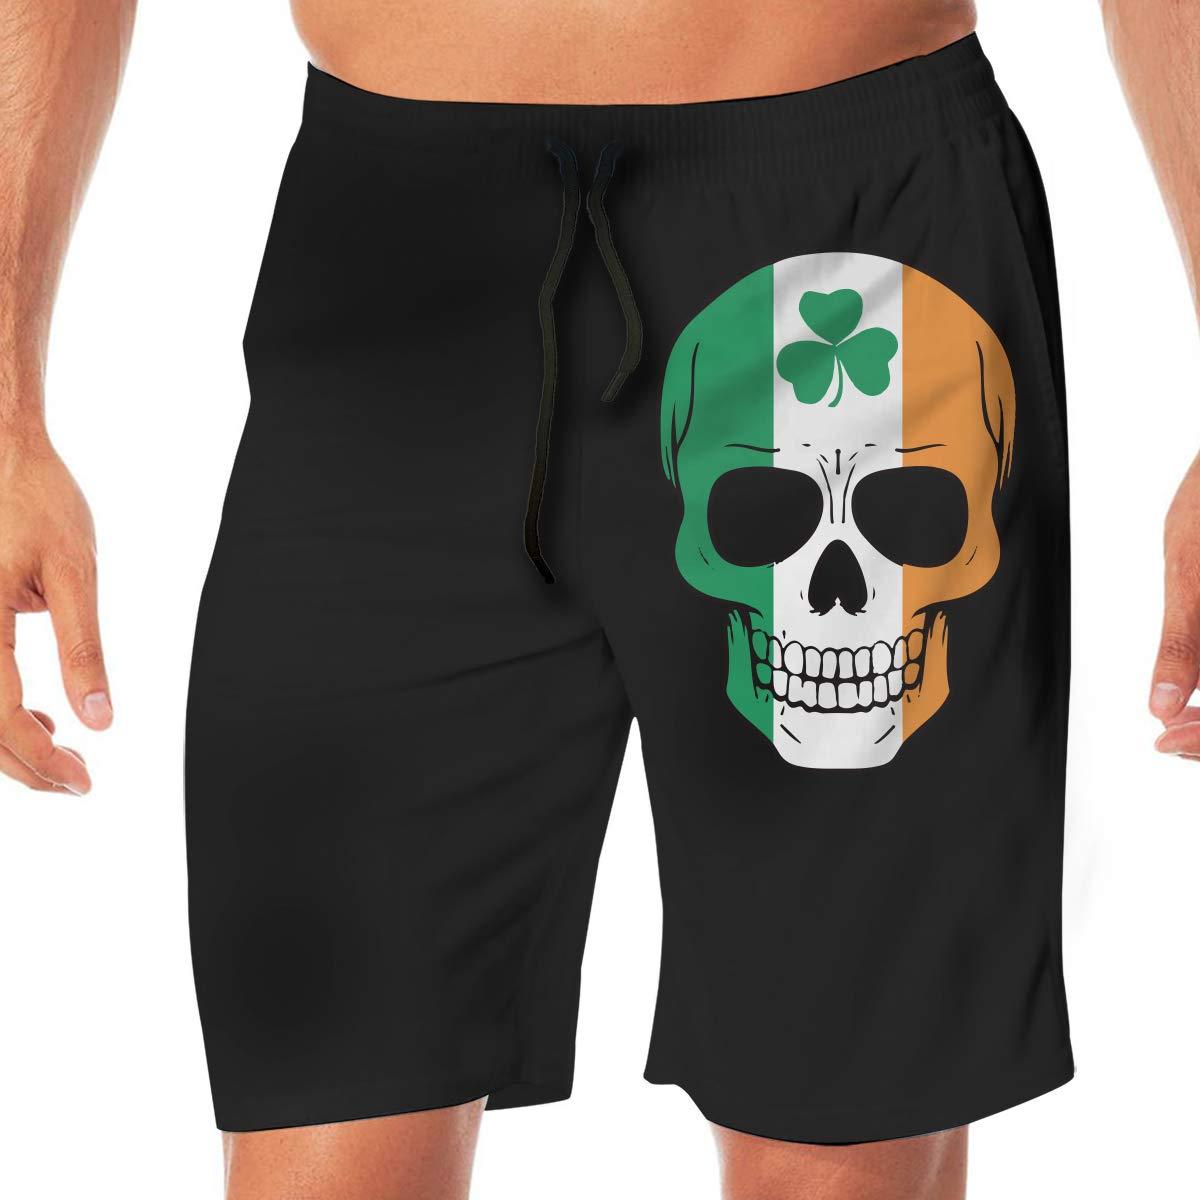 YGE.I.L25 Men Bathing Suit Irish Skull St Patricks Day Lightweight Beach Board Short Adults Boys